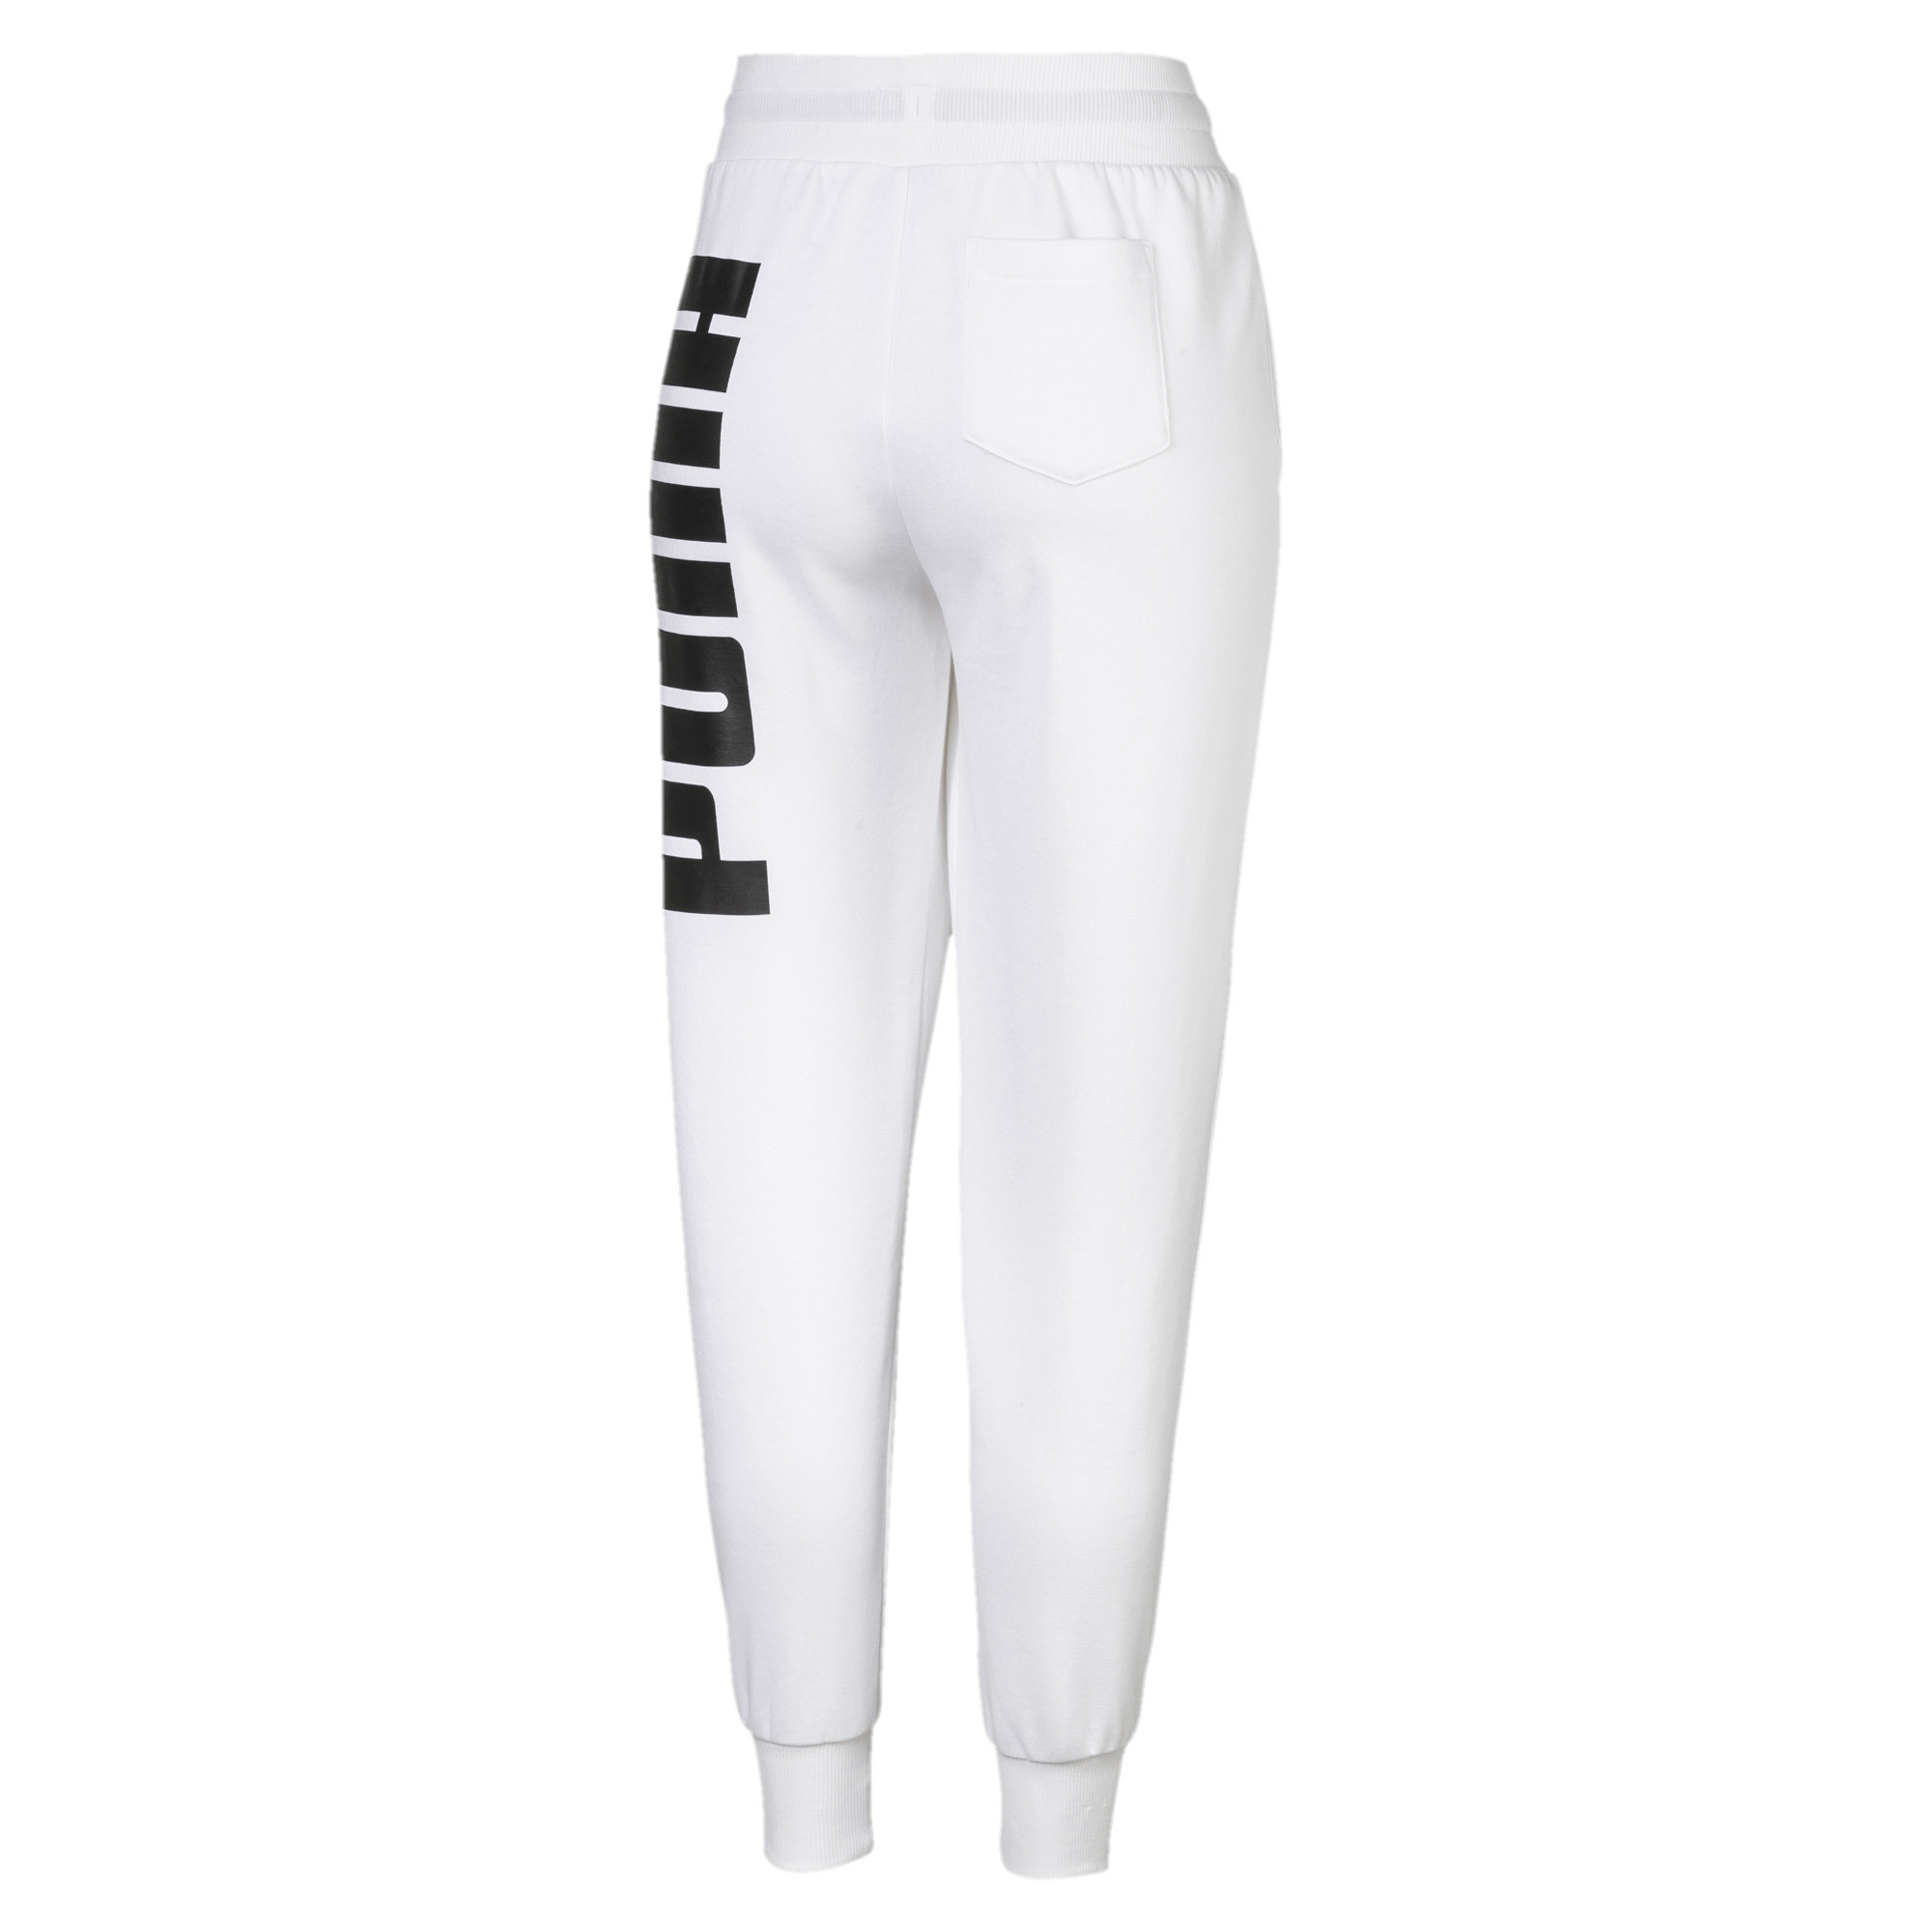 PUMA-Rebel-Women-039-s-Sweatpants-Women-Knitted-Pants-Basics thumbnail 8